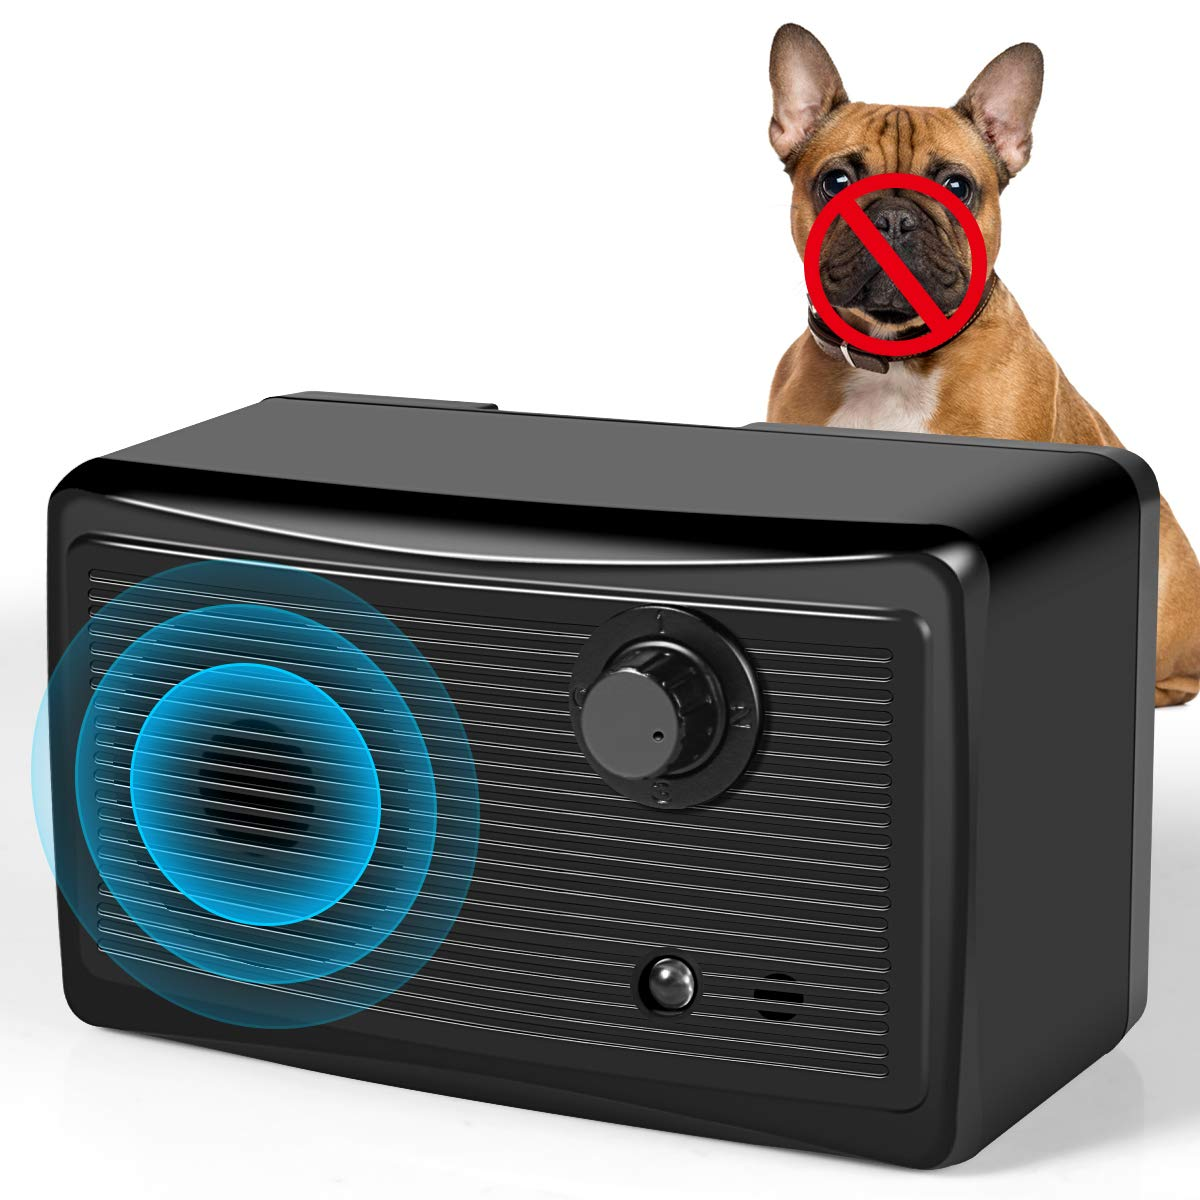 Bark Control Device, Upgraded Mini Bark Control Device Outdoor Anti Barking Ultrasonic Dog Bark Control Sonic Bark Deterrents Silencer Stop Barking Anti Barking Device by PETBROO